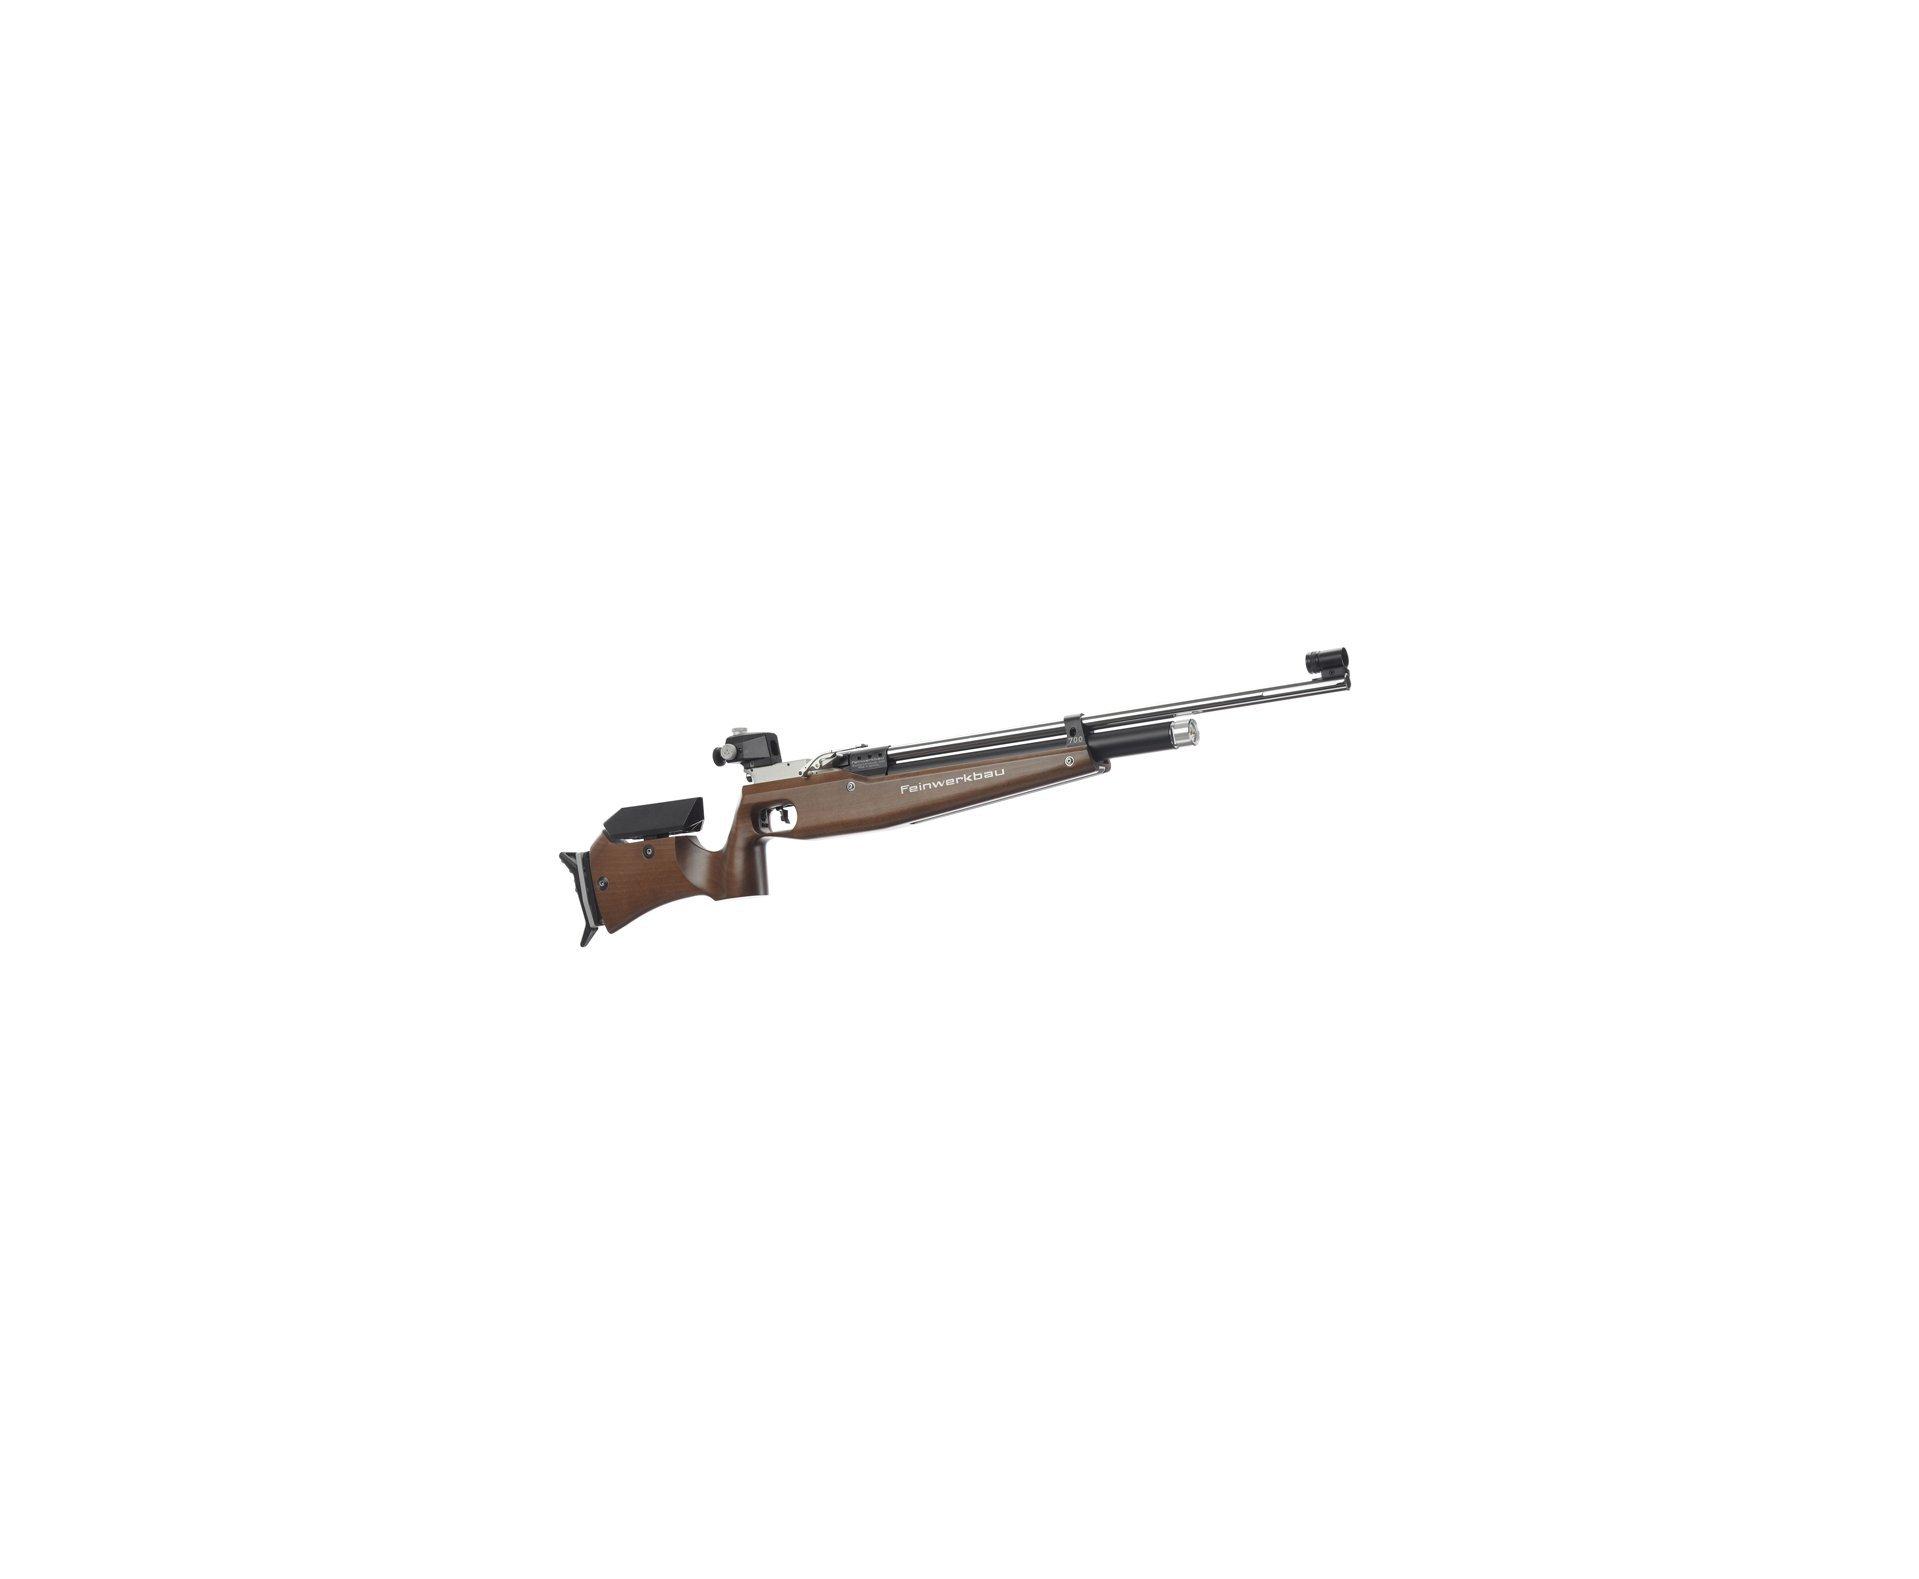 Rifle Feinwerkbau 700 Basic - Calibre 4,5 Mm - Pcp